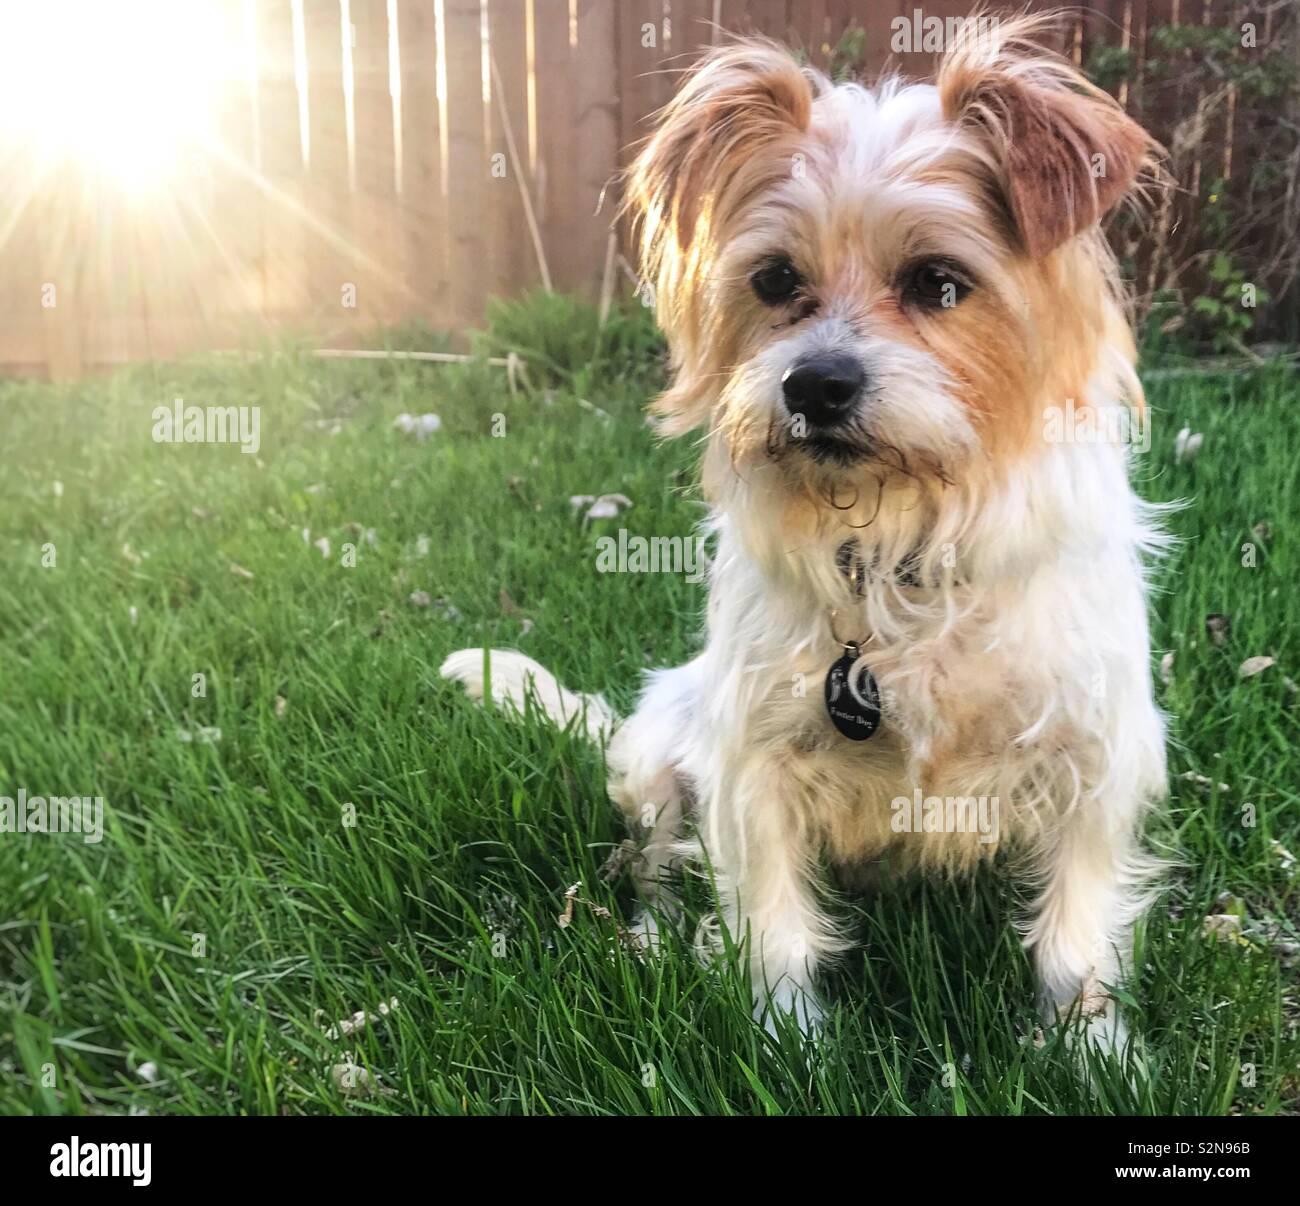 Terrier Dog - Stock Image